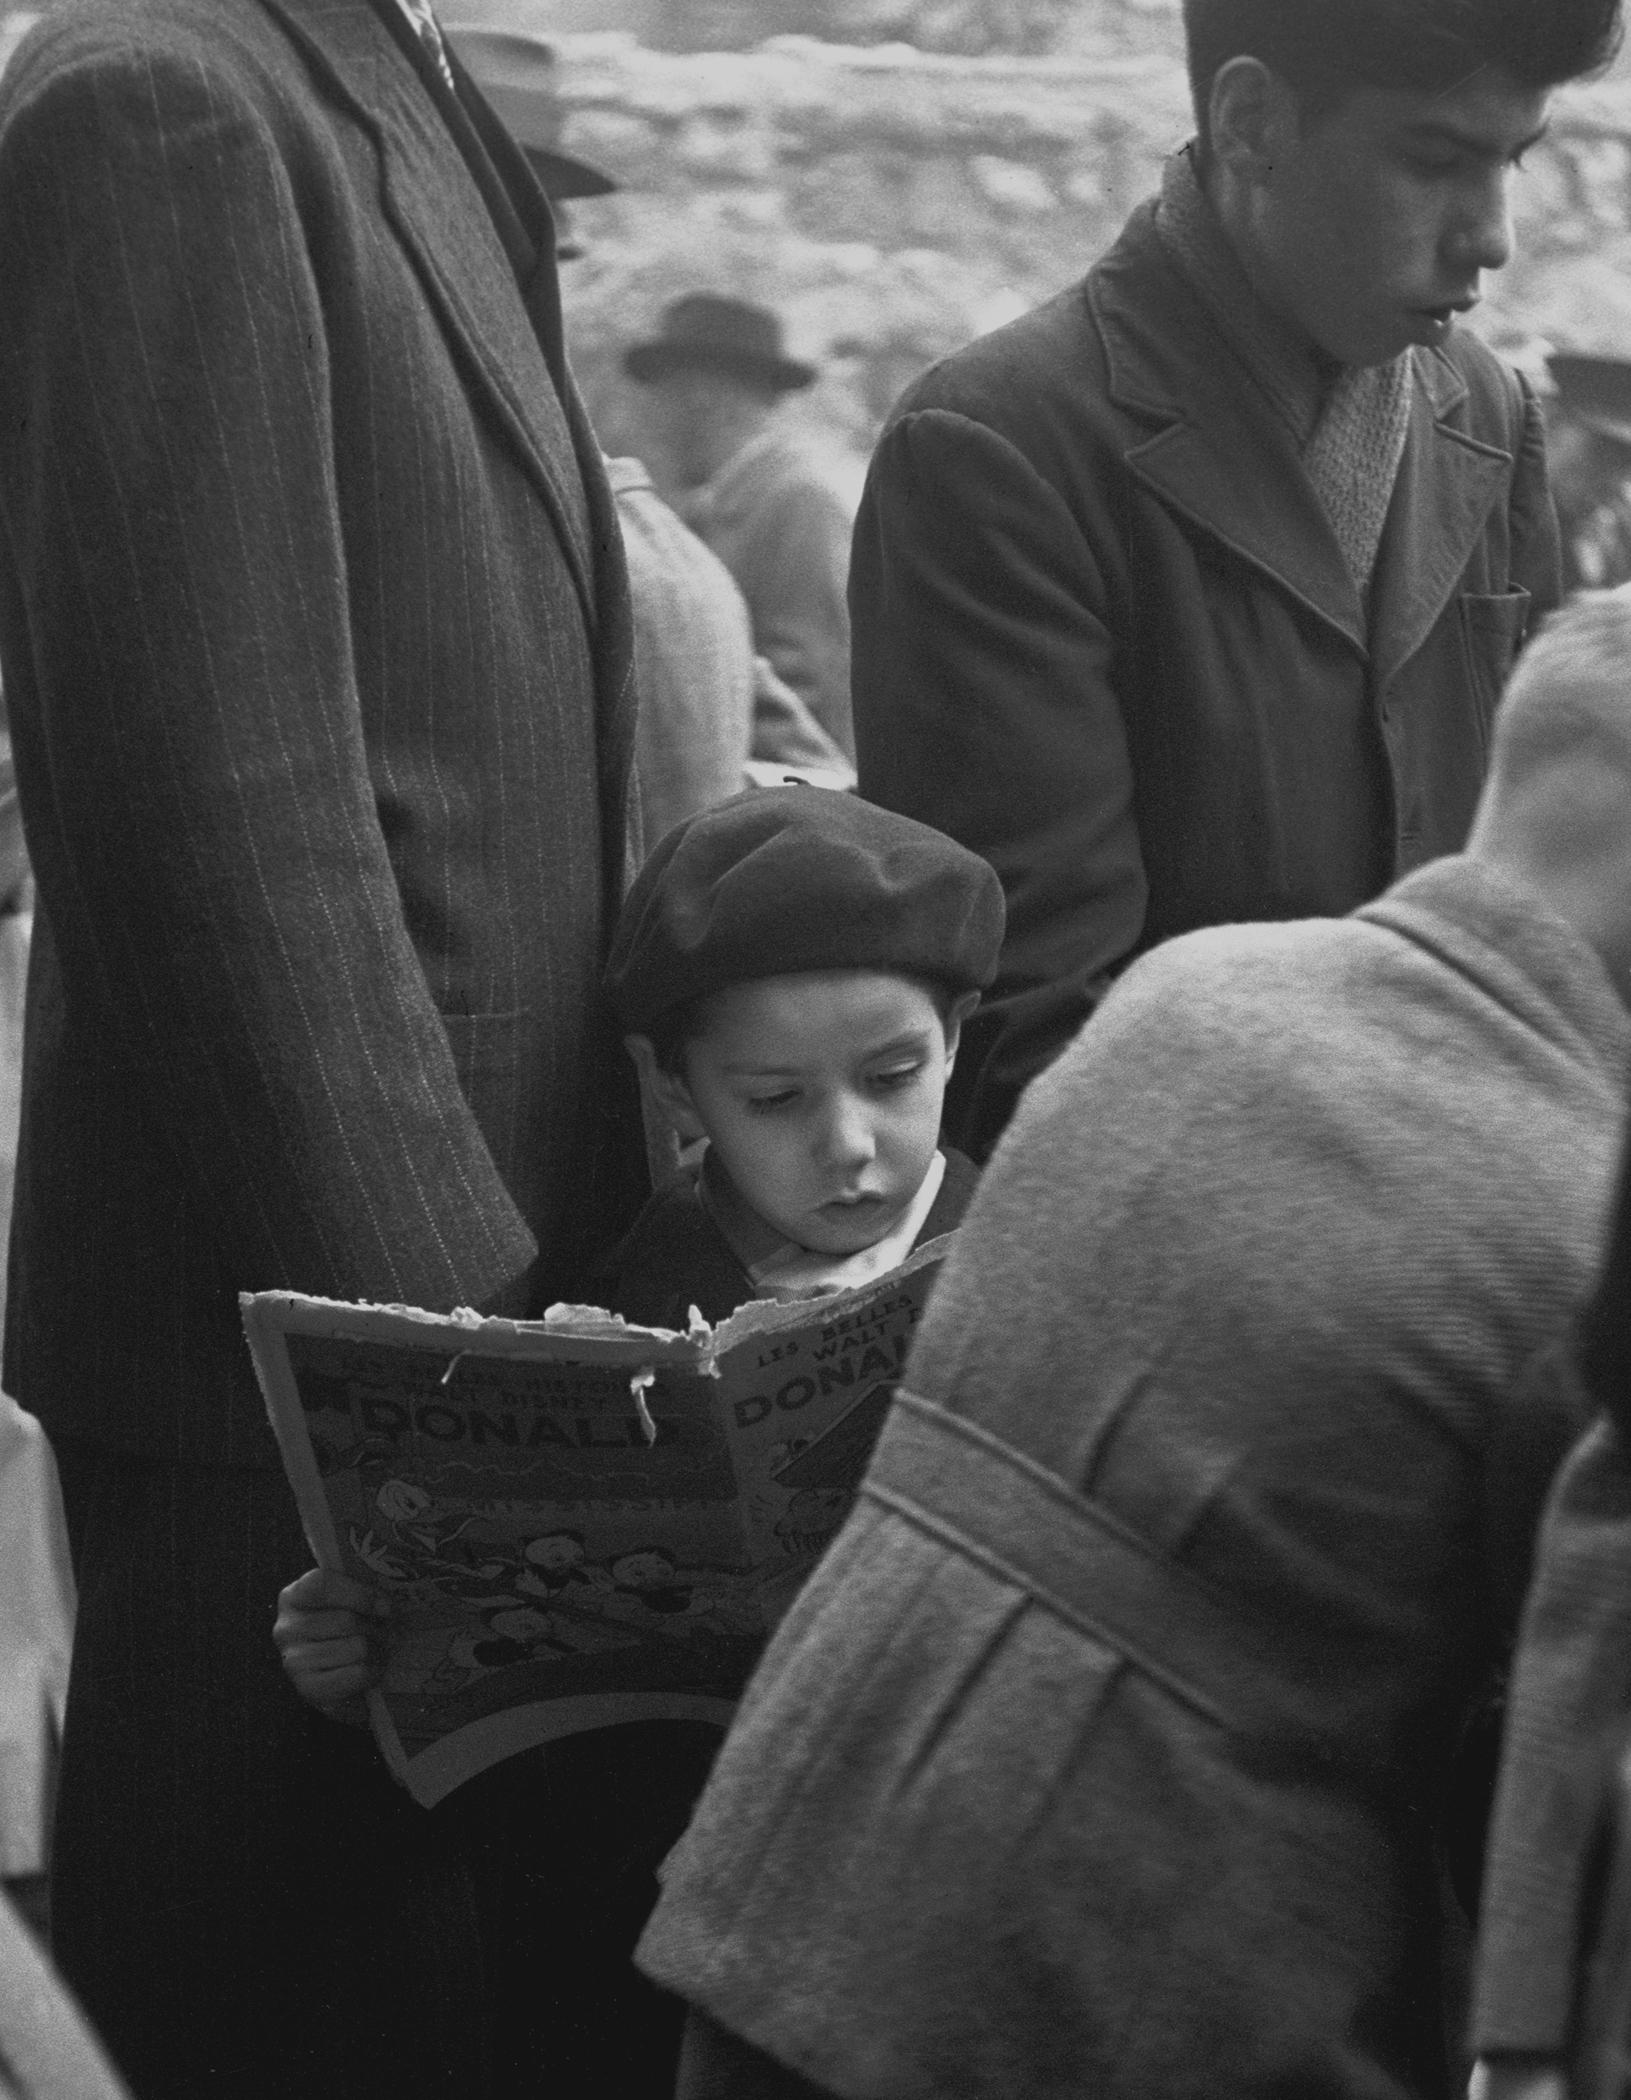 COMIC BOOK MARKET - 1949